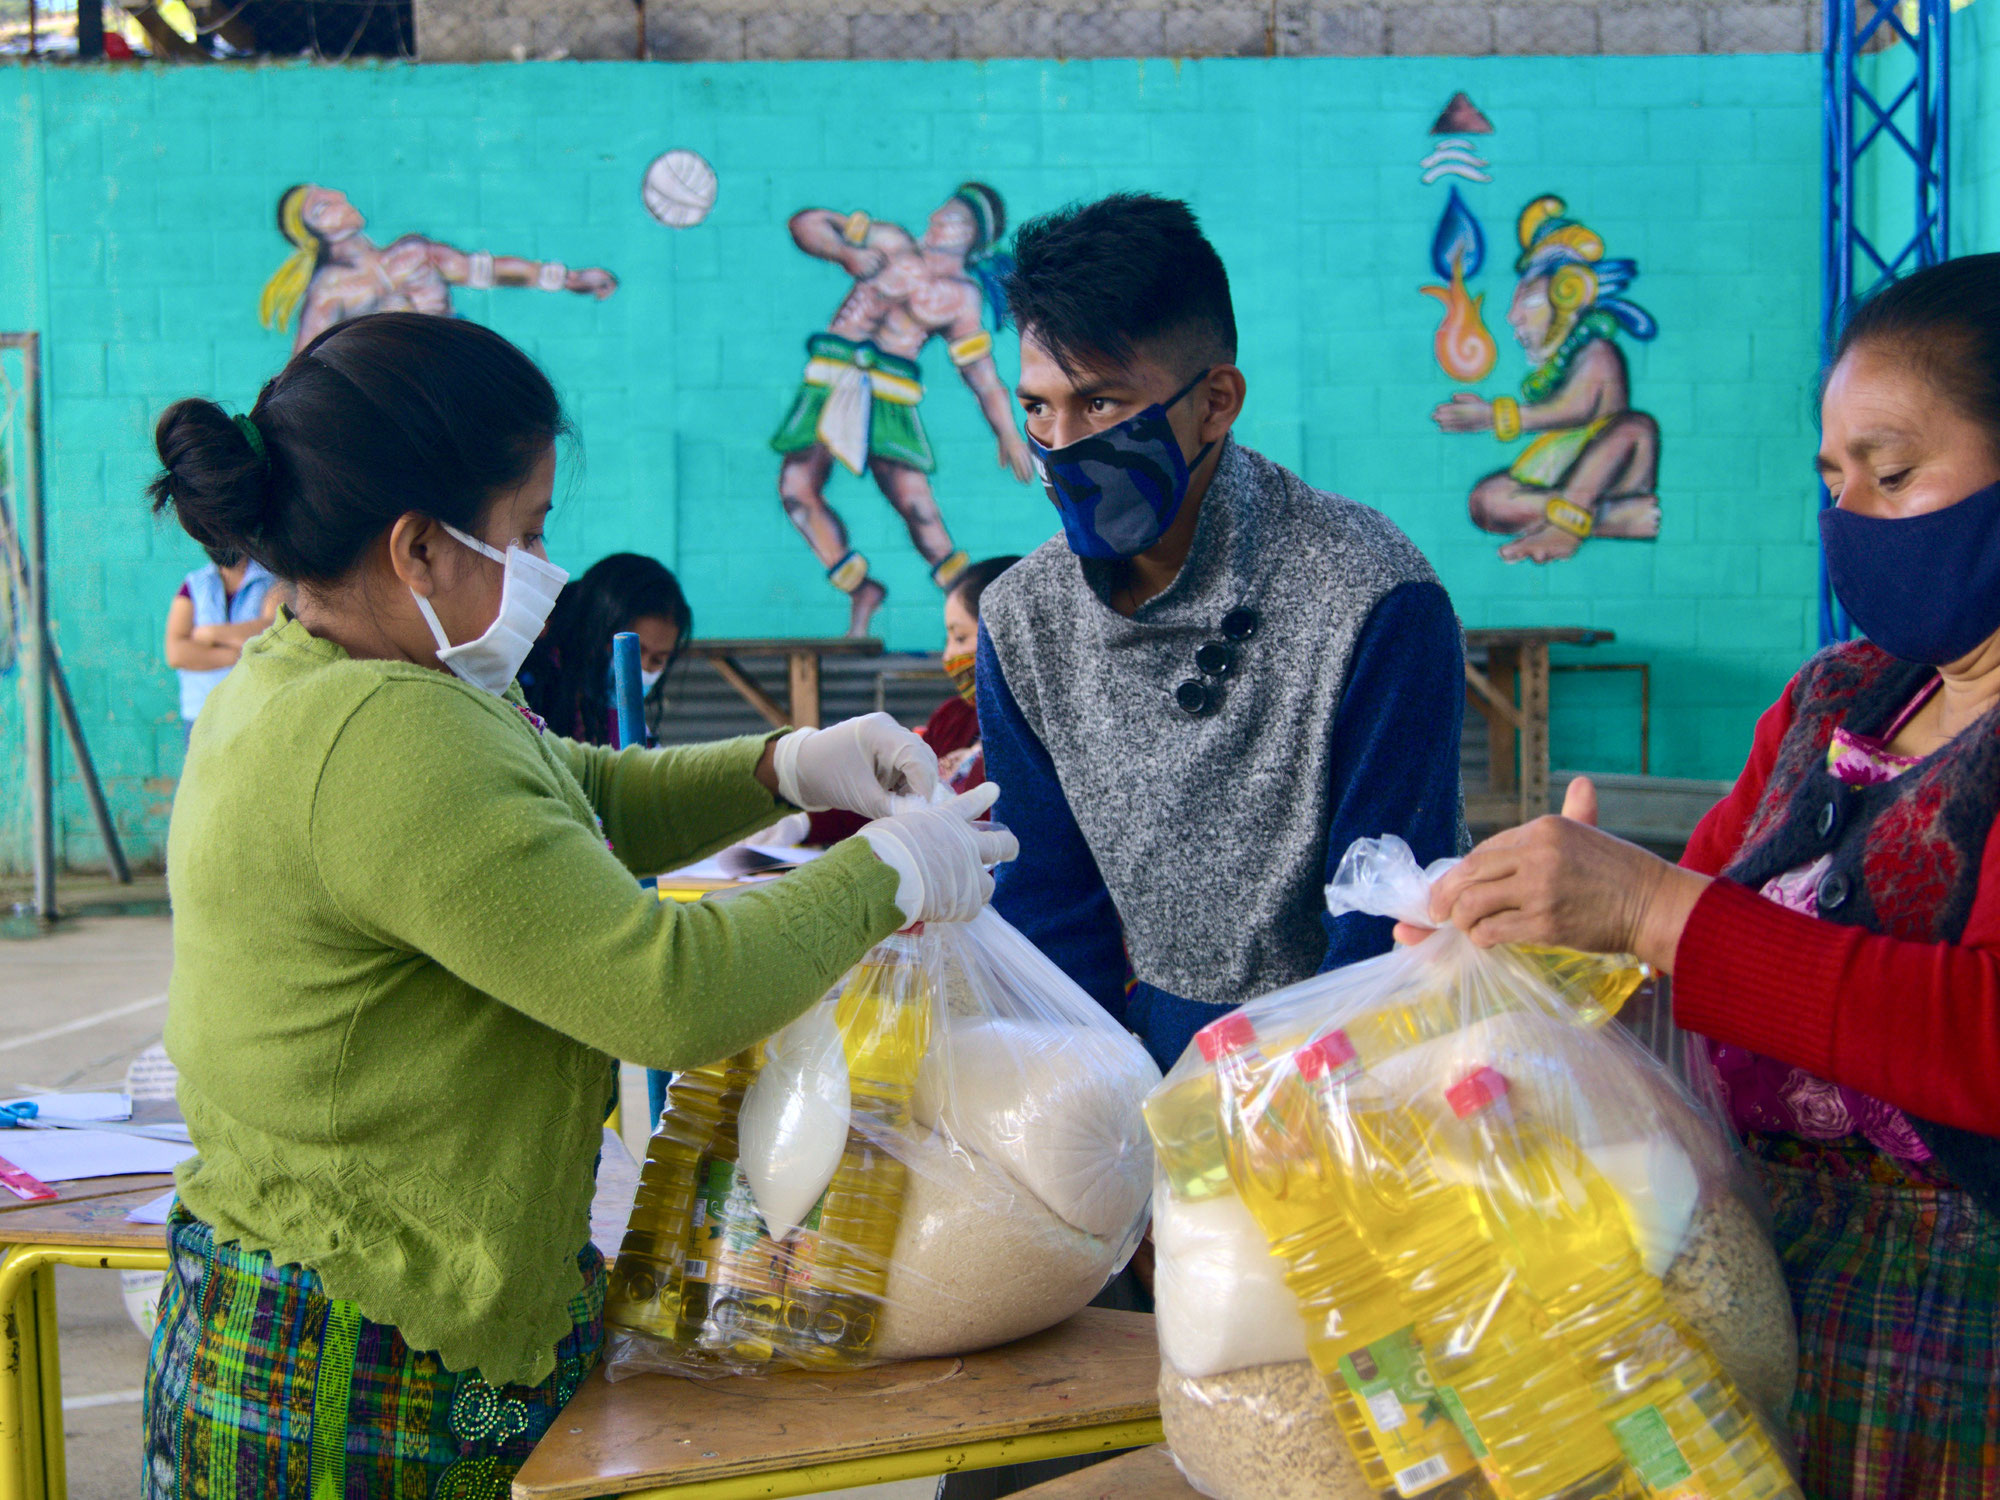 Coronahilfe: Erste Lebensmittelpakete an 140 Familien in Las Rosas verteilt